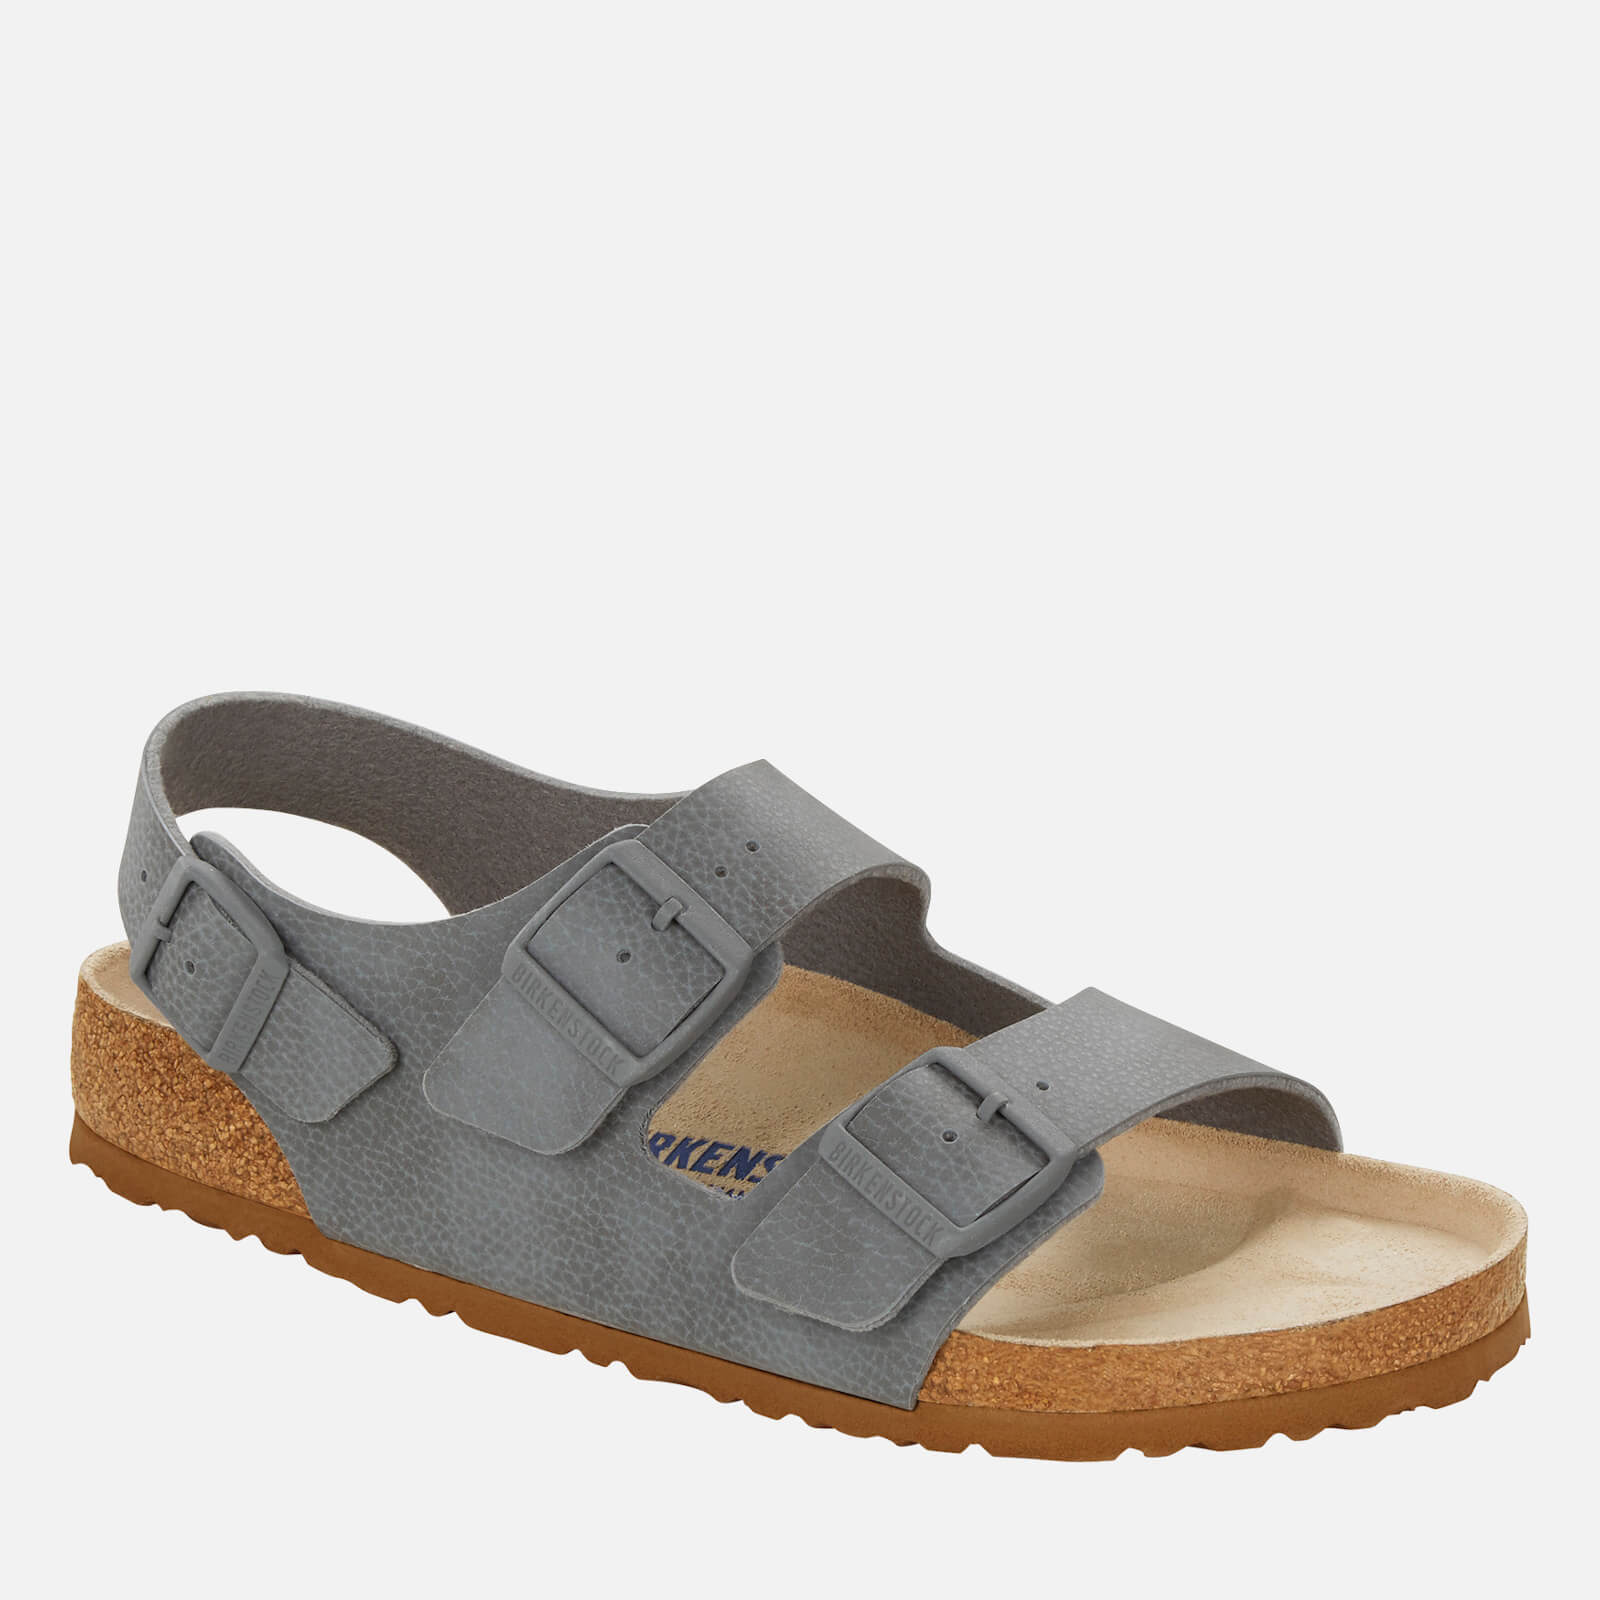 Birkenstock Mens Milano Double Strap Sandals Desert Soil Grey Eu 40 Uk 7